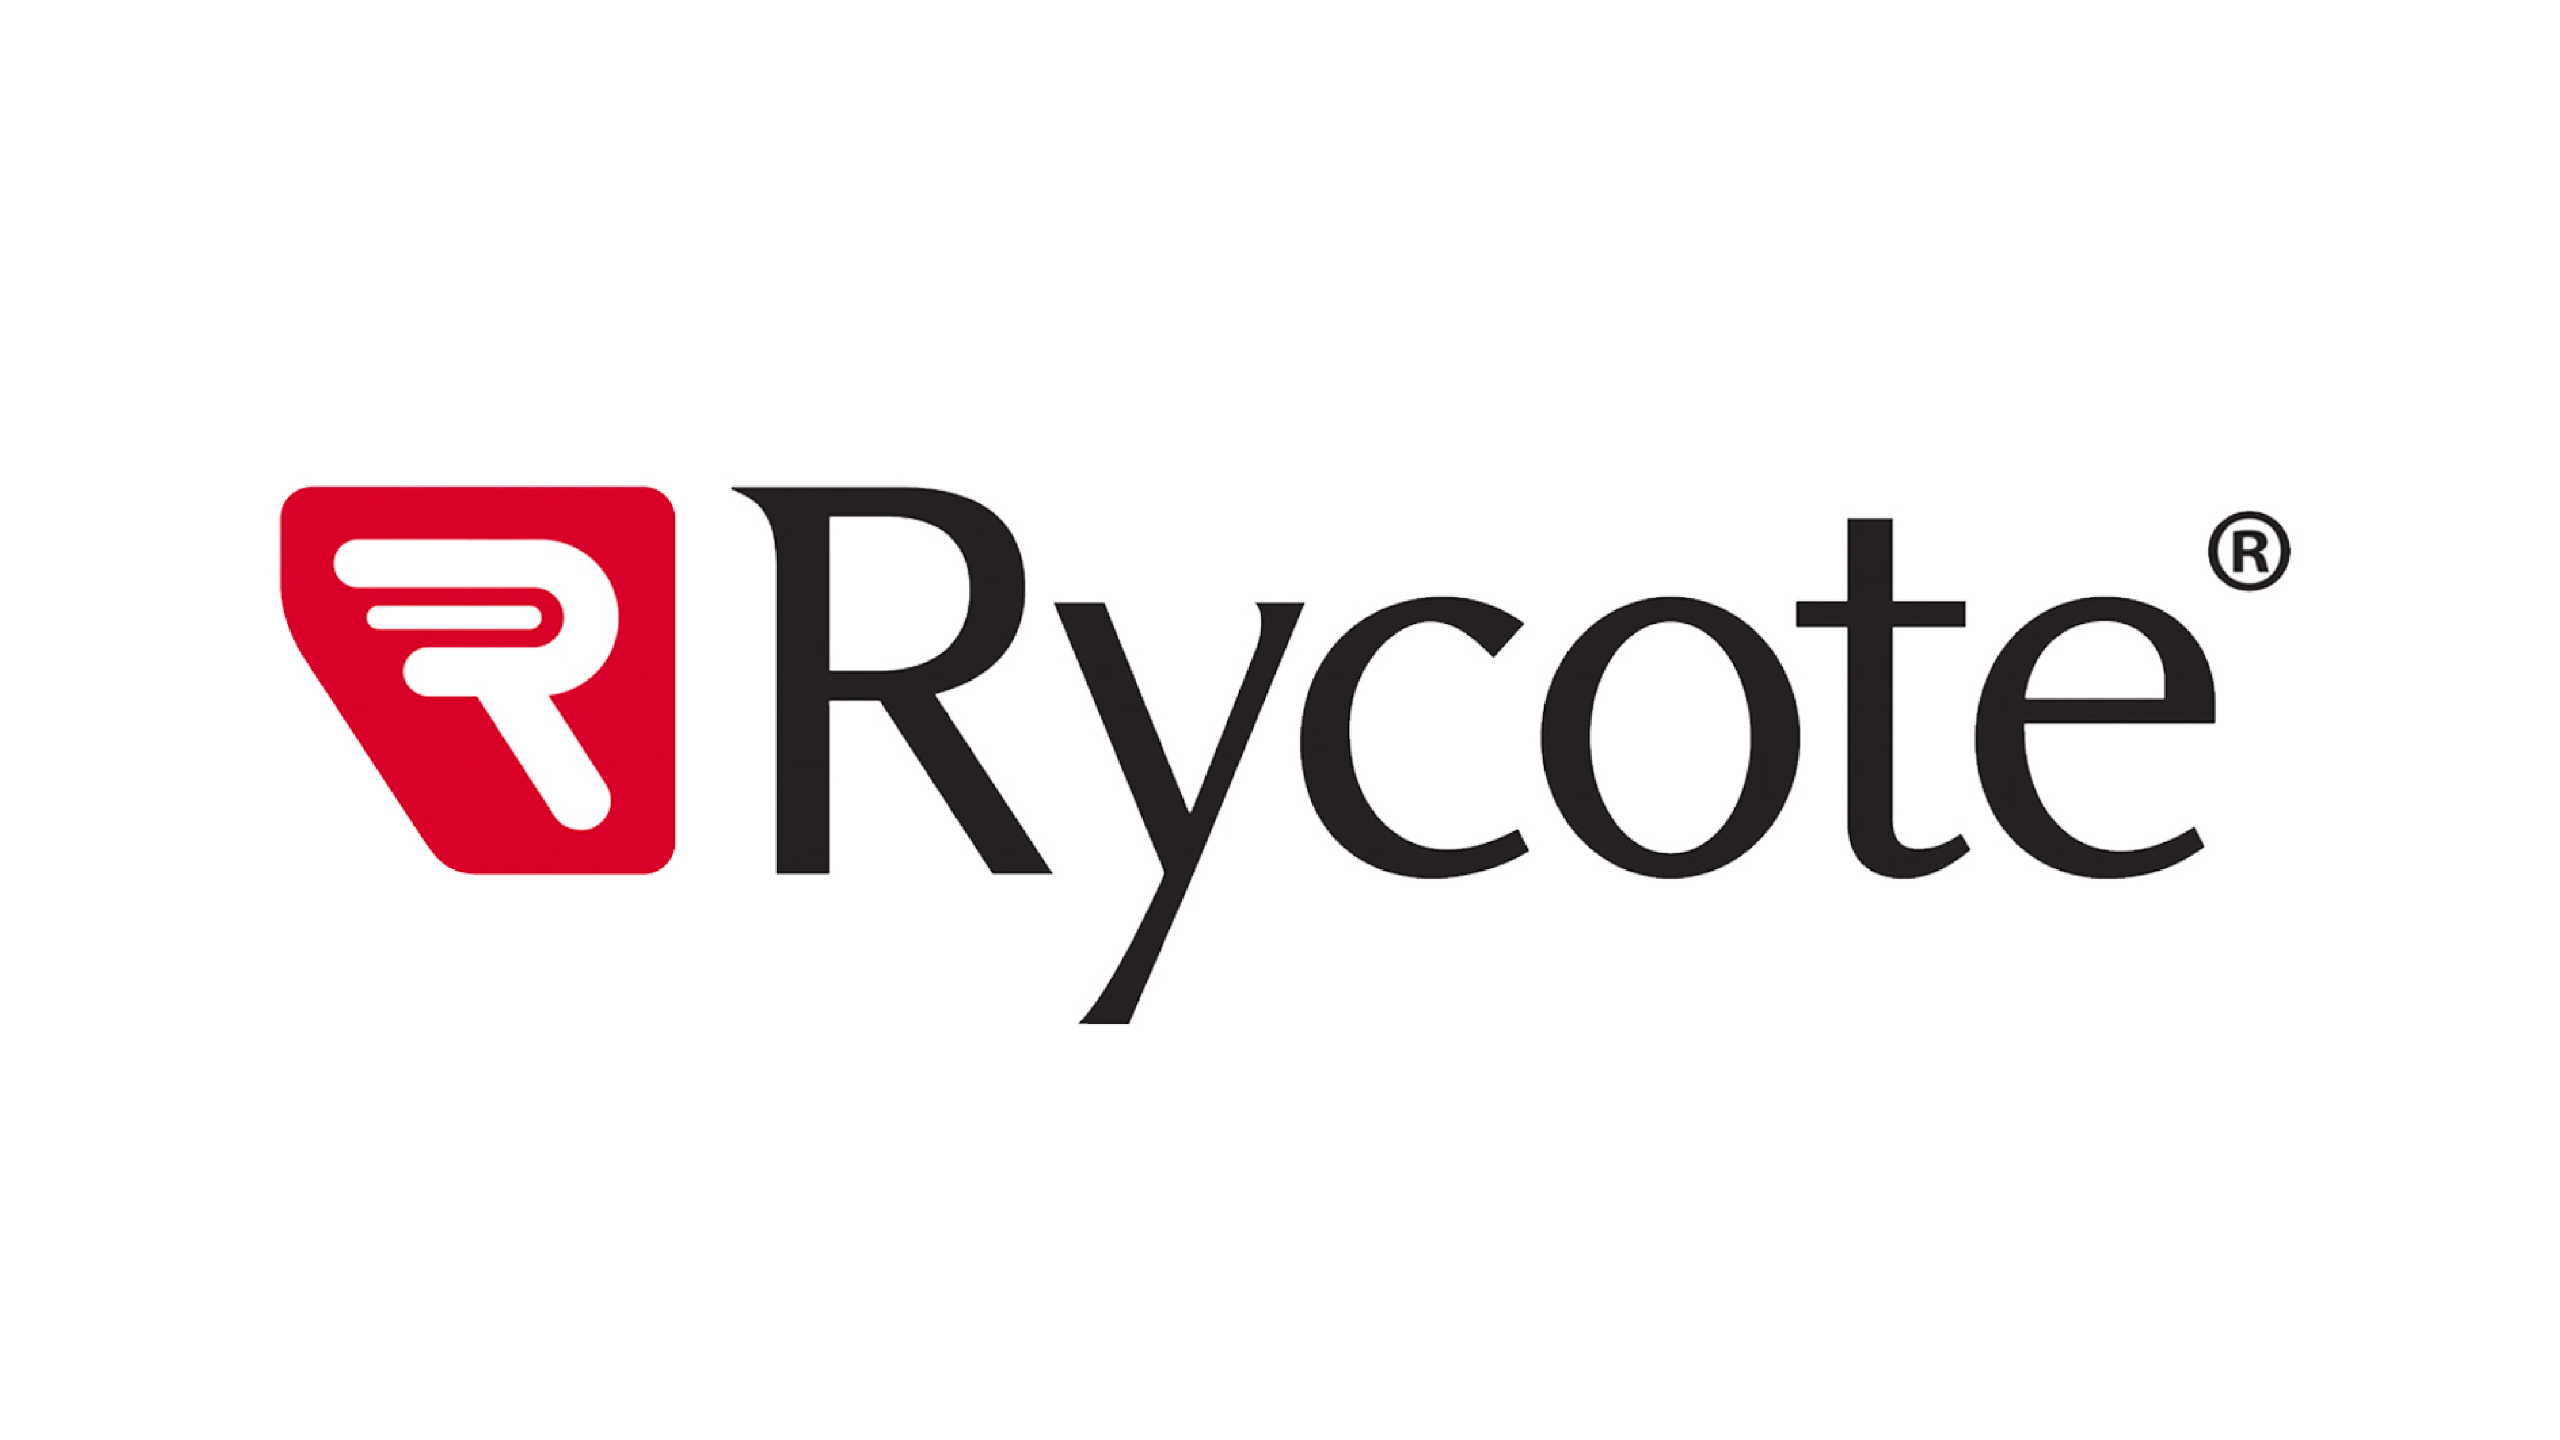 Rycote Logo